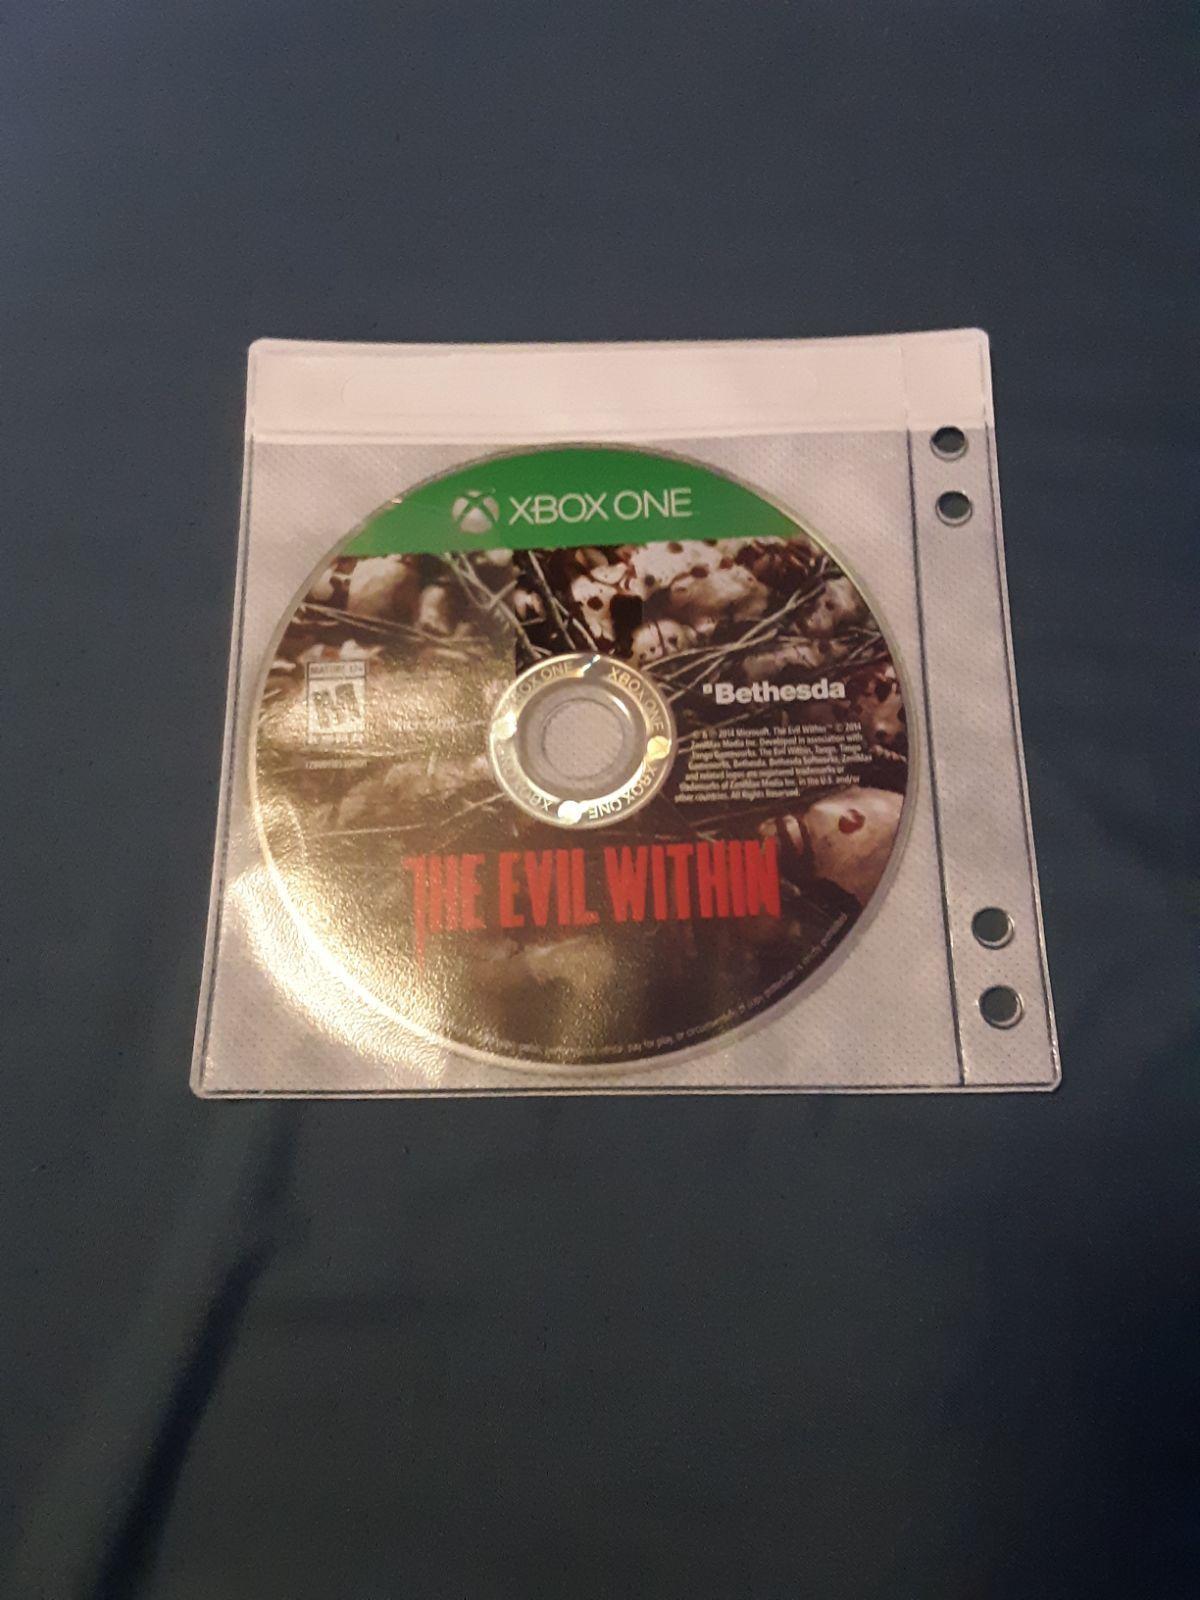 8d561a5804706e6c25eb9eeb3923a729 - How To Get Disc Out Of Xbox One S